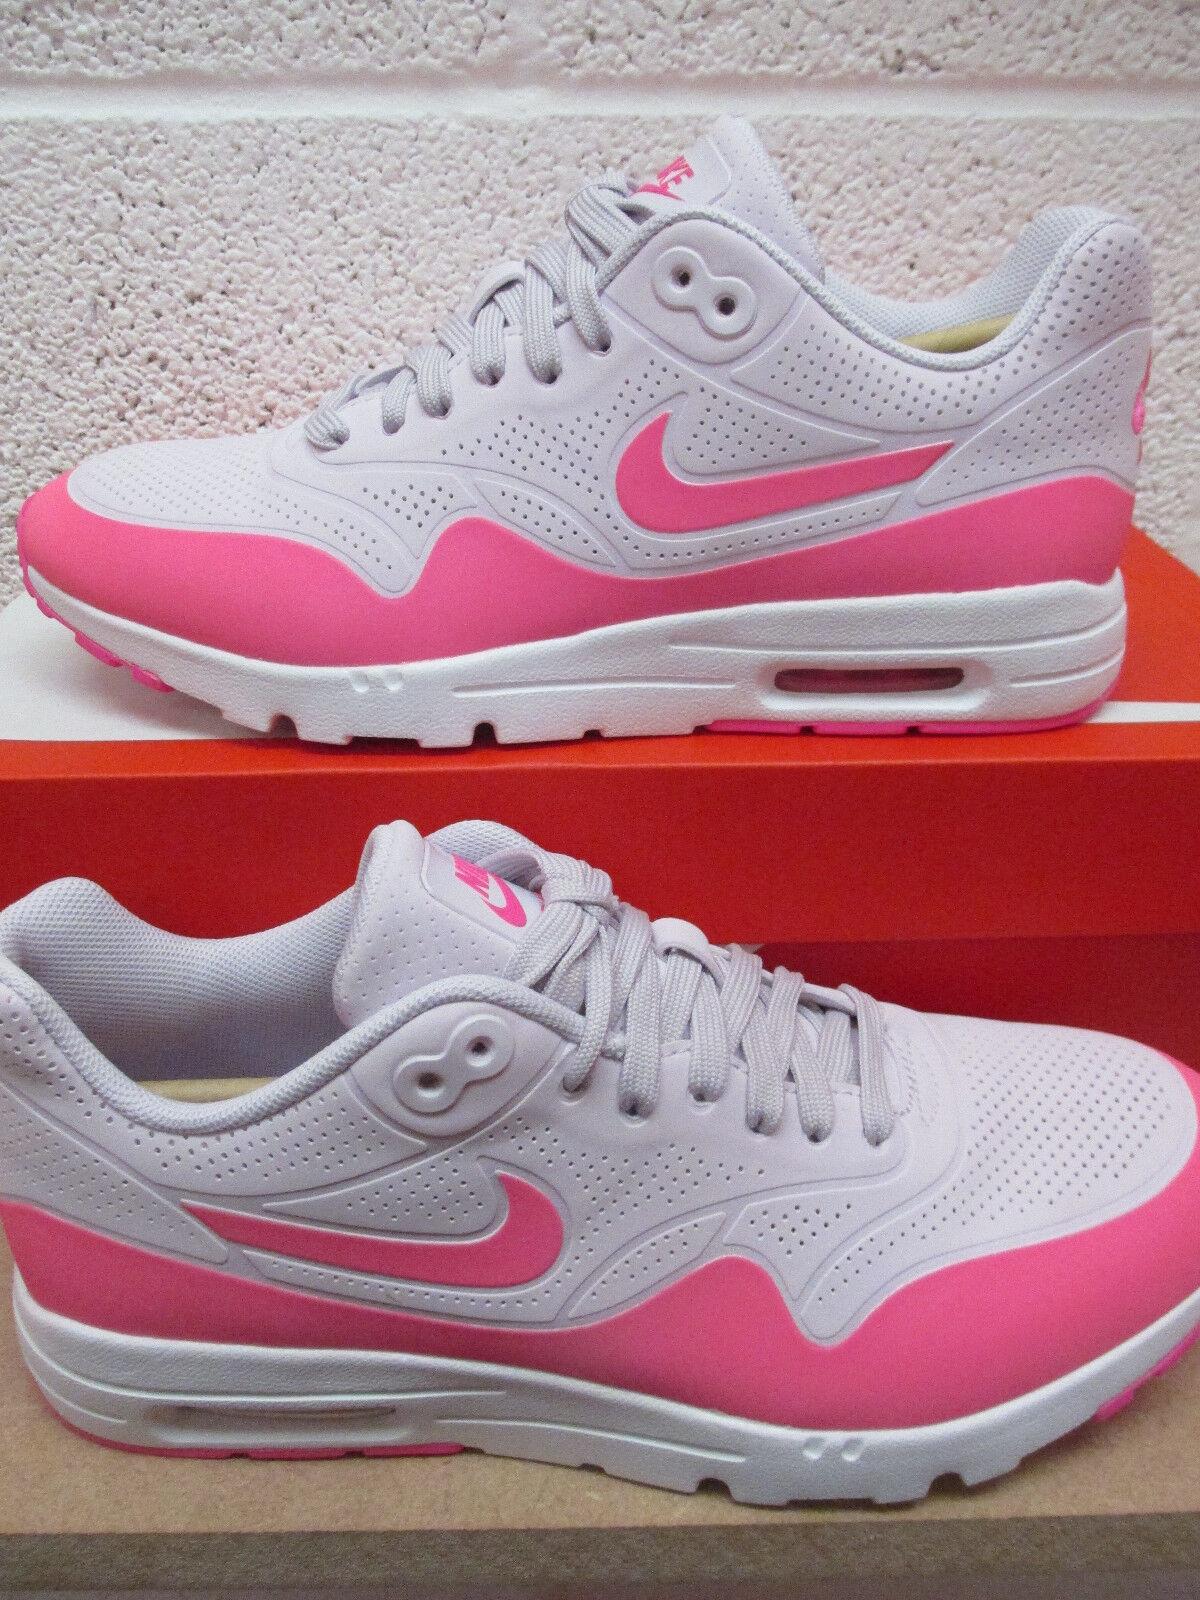 Nike Air Max 1 Ultra Moire Femme Baskets 704995 501 Baskets Chaussures